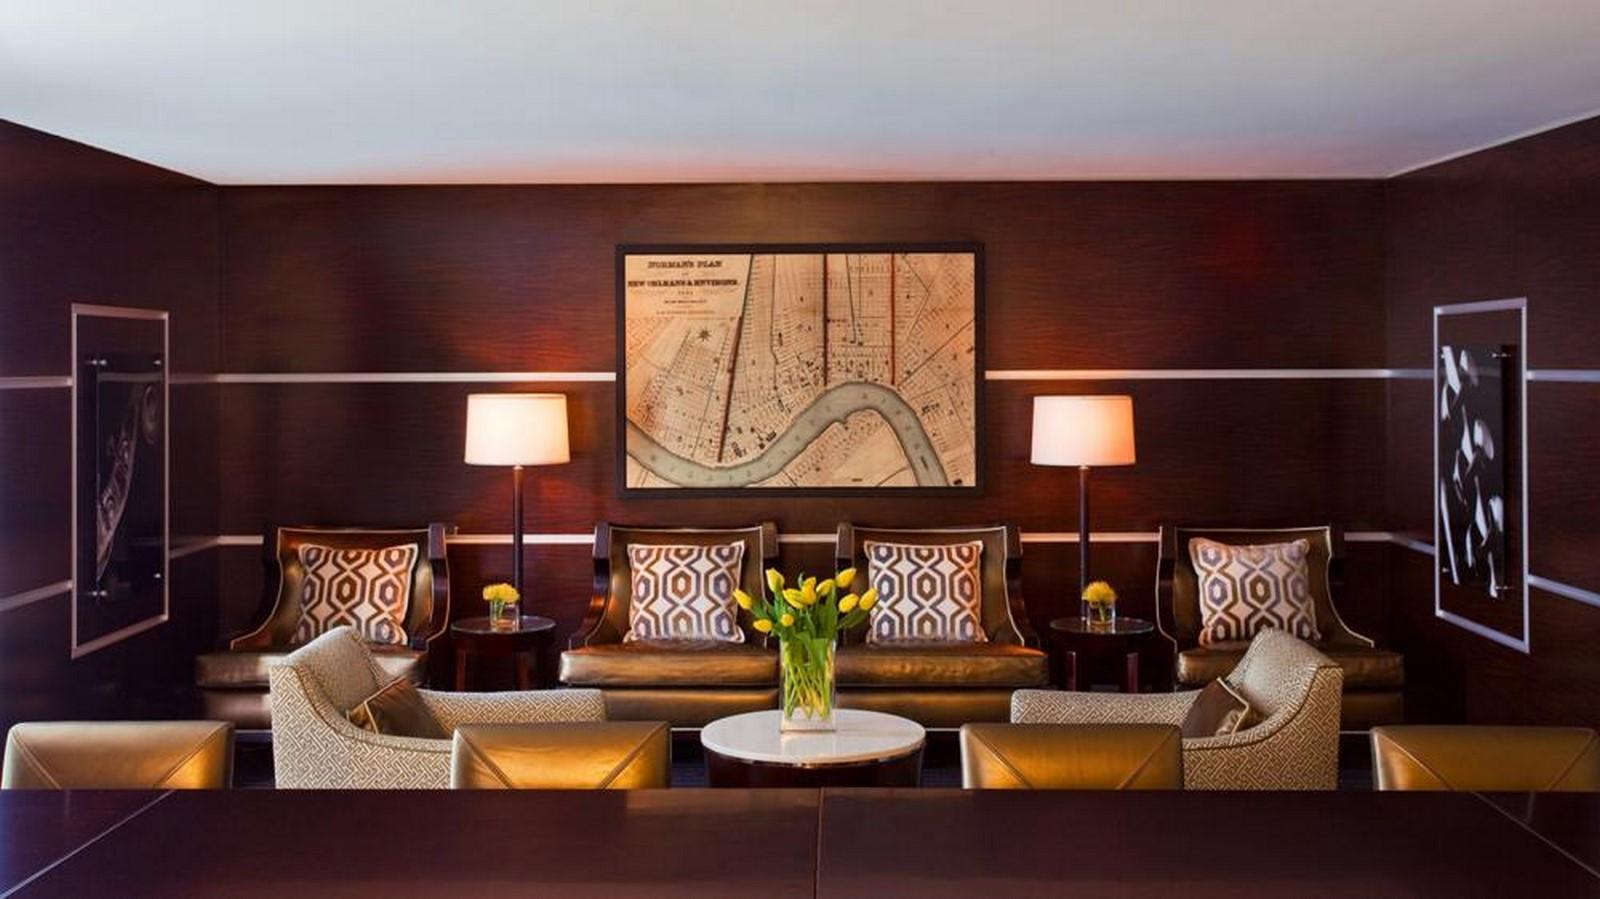 Sheraton Hotel, New Orleans - Sheet1